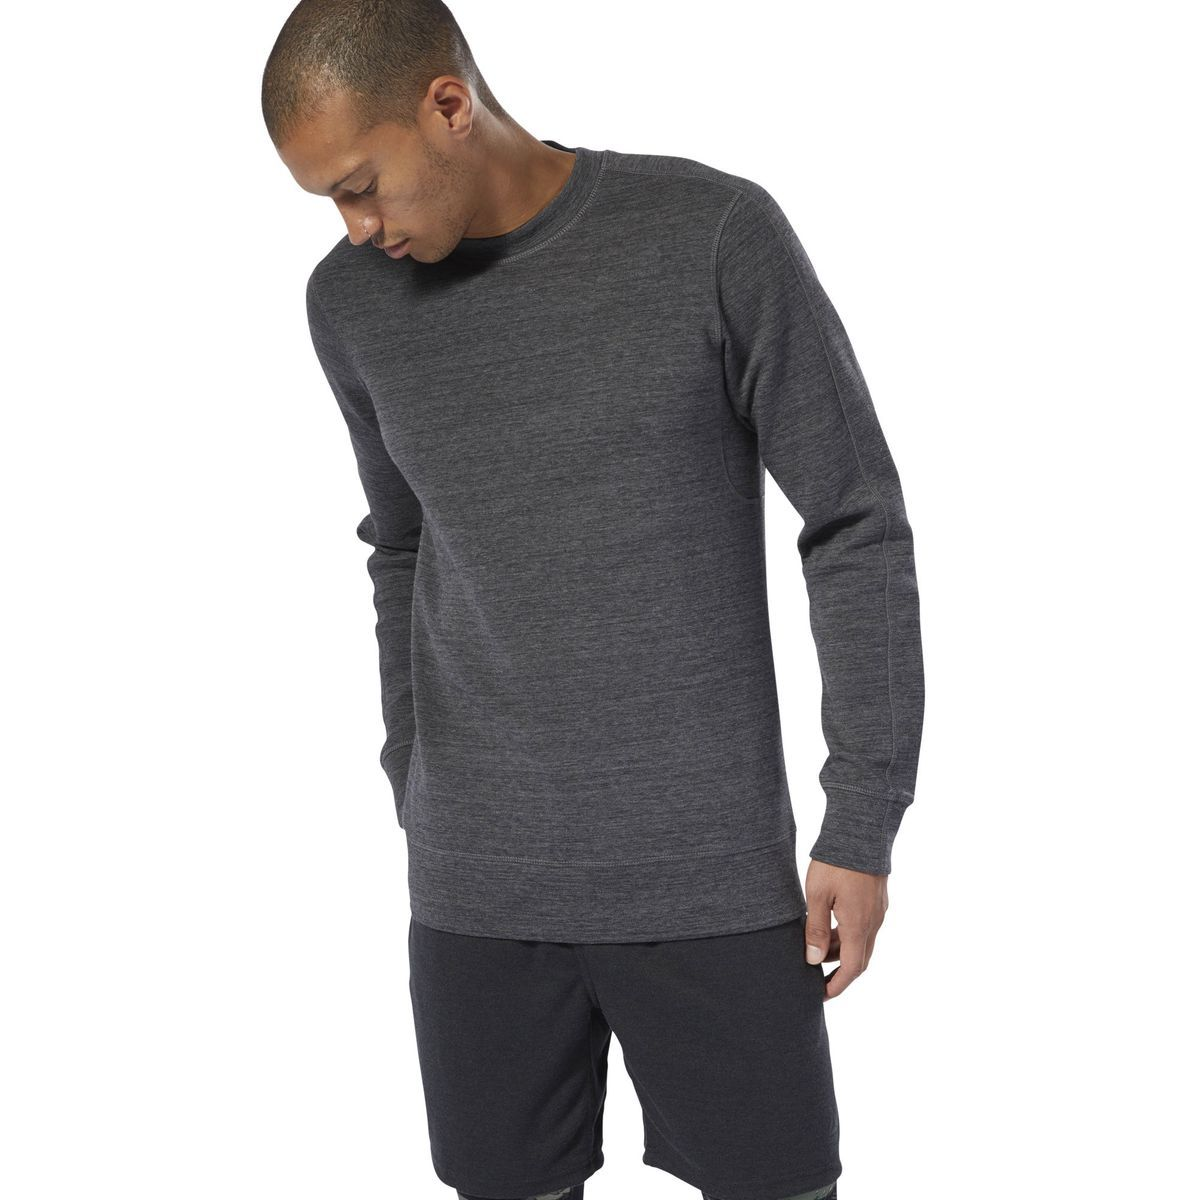 Sweat à col rond Reebok CrossFit® | Reebok, T shirt et